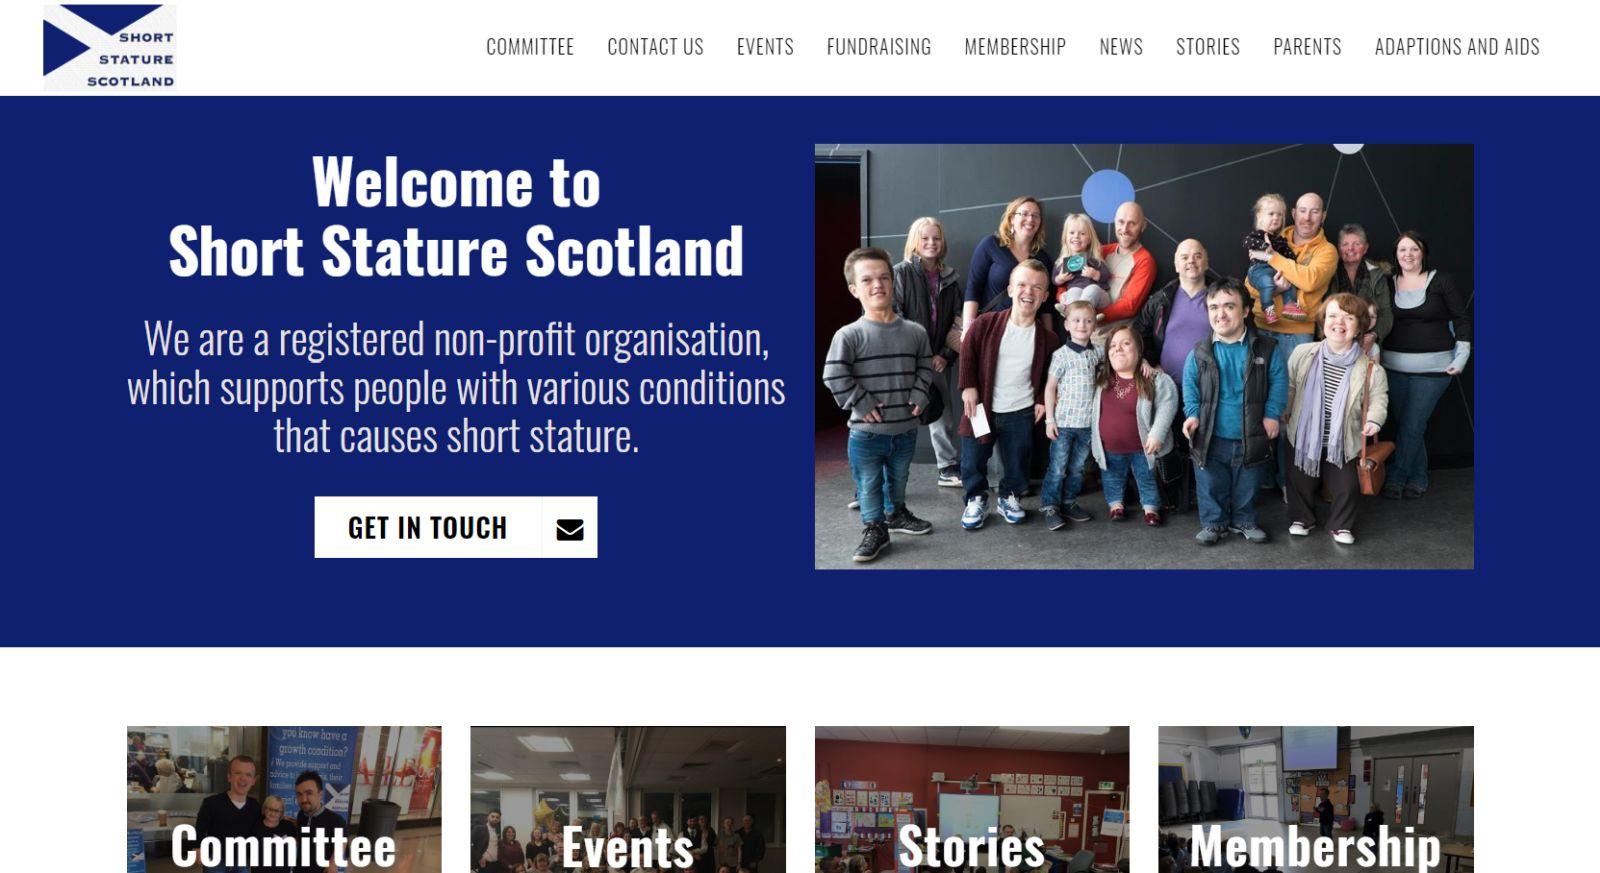 Short Stature Scotland Homepage